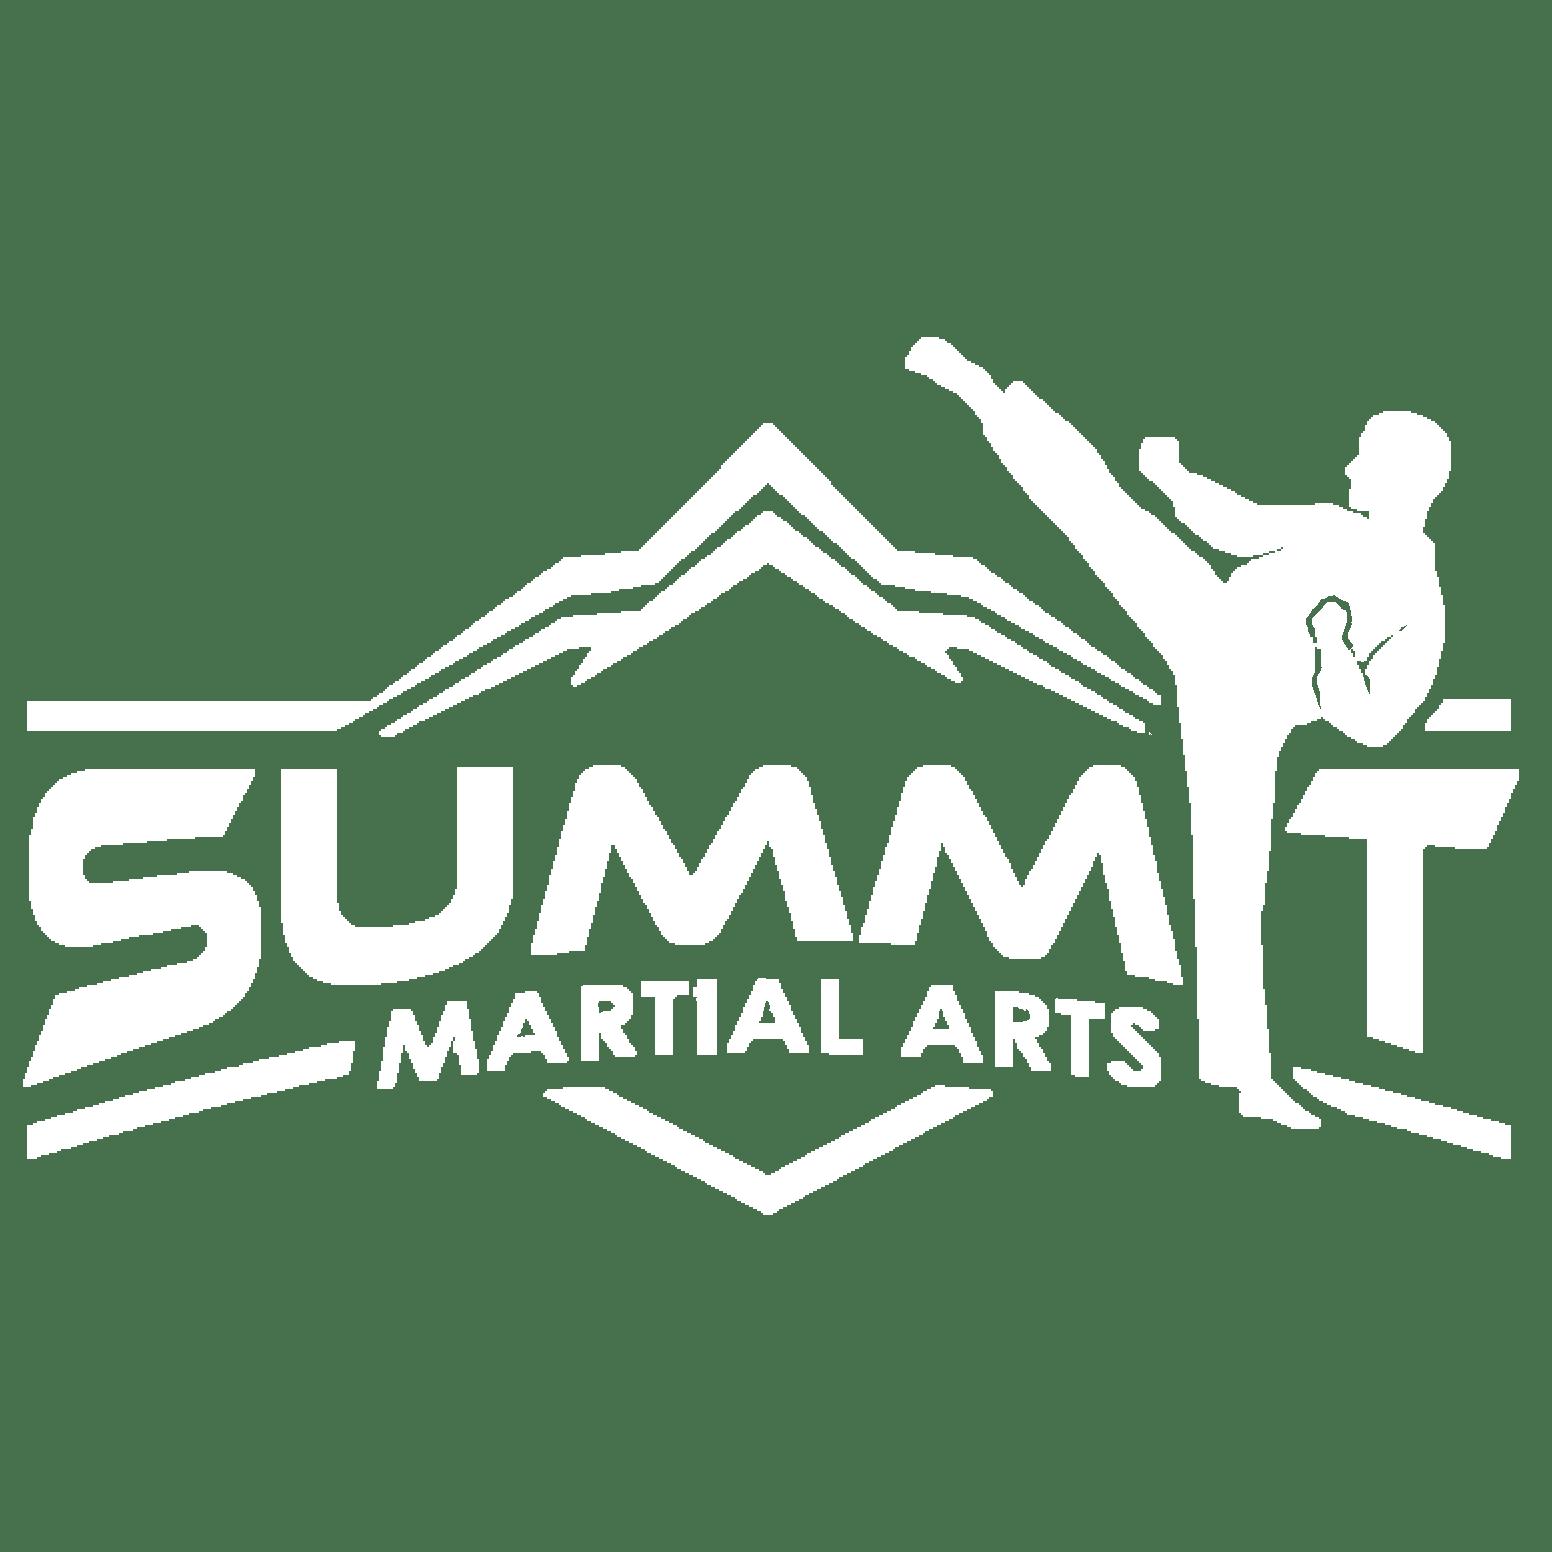 Summut Proglogo 1, Summit Martial Arts in Mason City, IA